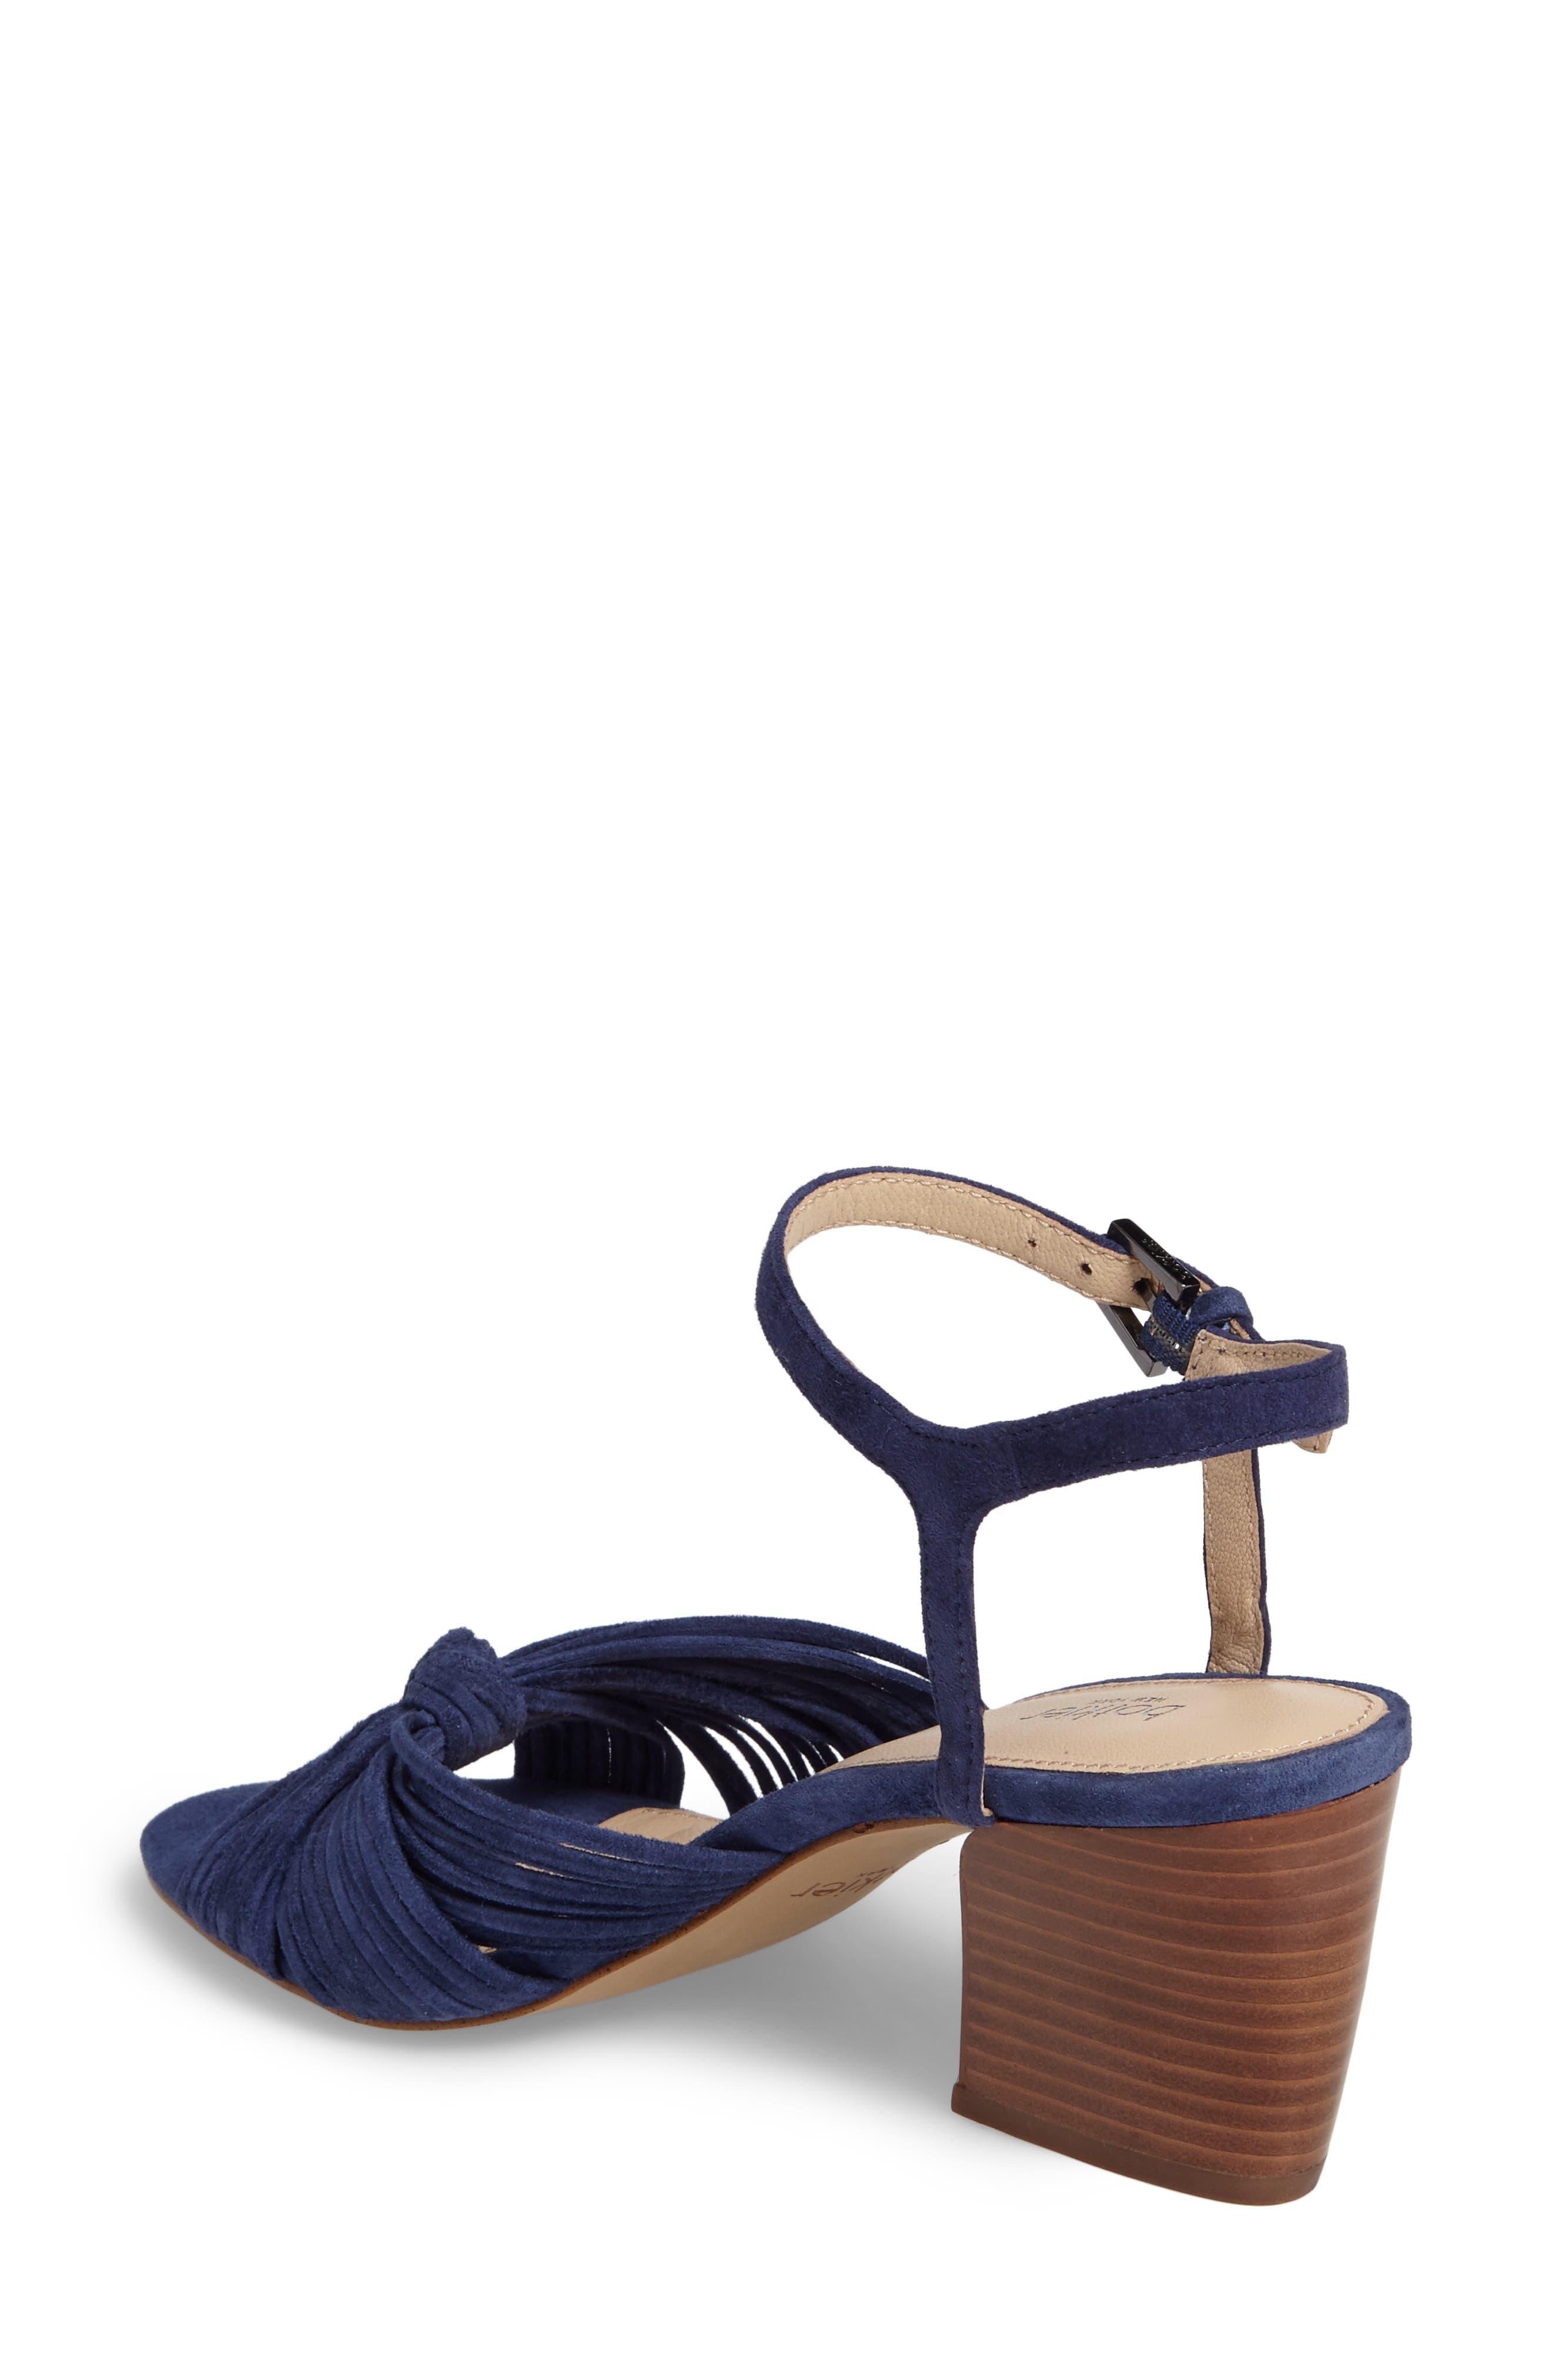 Patsy Block Heel Sandal,                             Alternate thumbnail 2, color,                             Navy